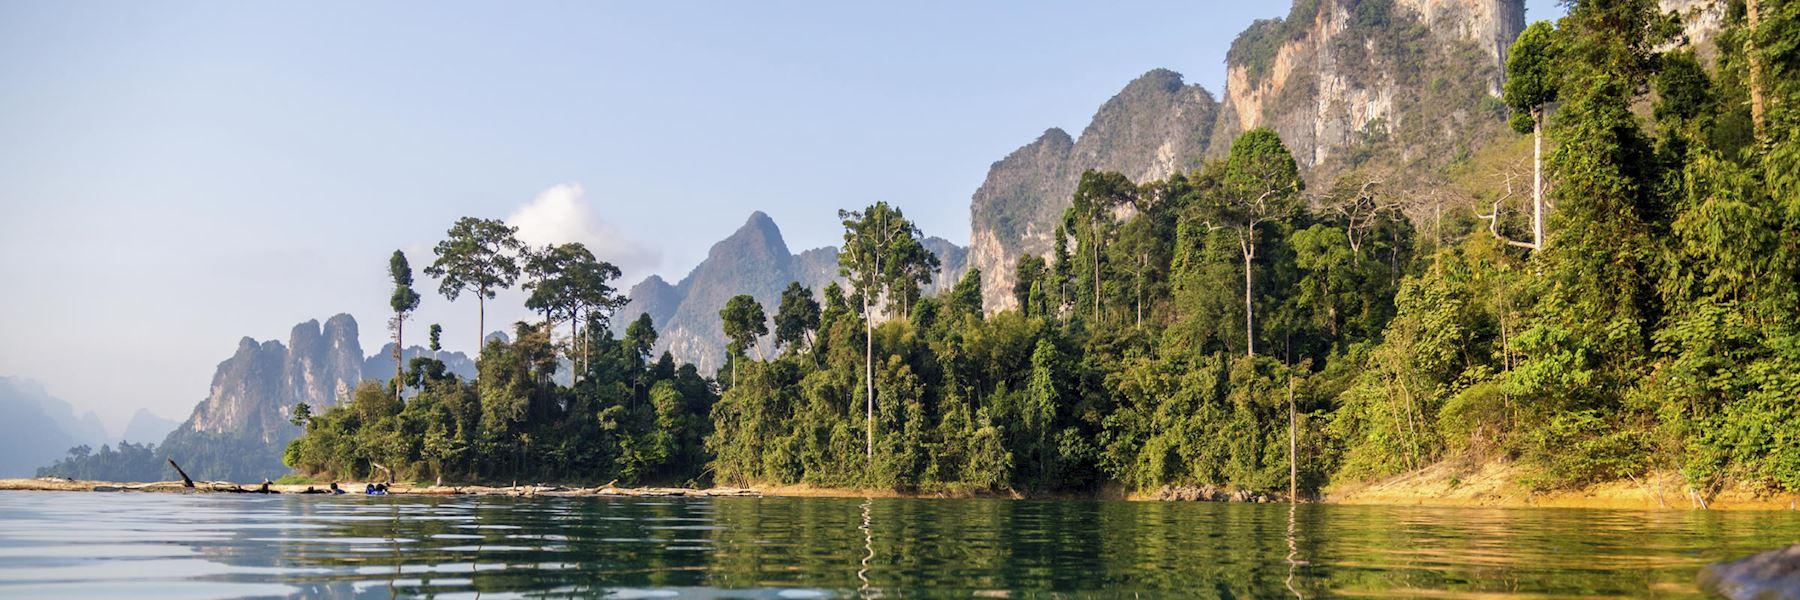 Visit Khao Sok National Park, Thailand